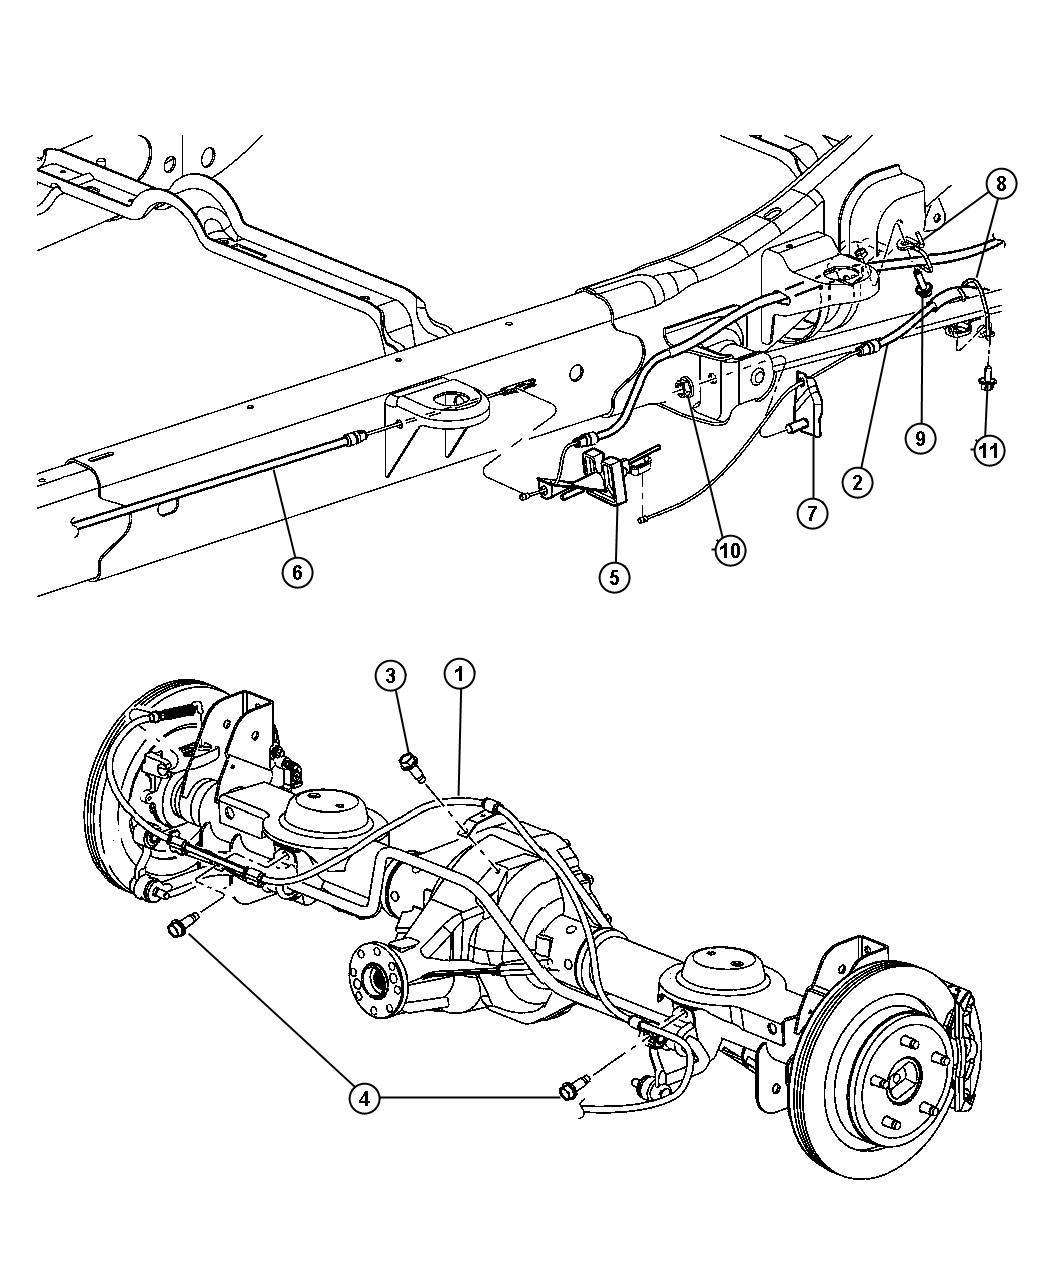 Dodge Durango Cable Parking Brake Left Rear System